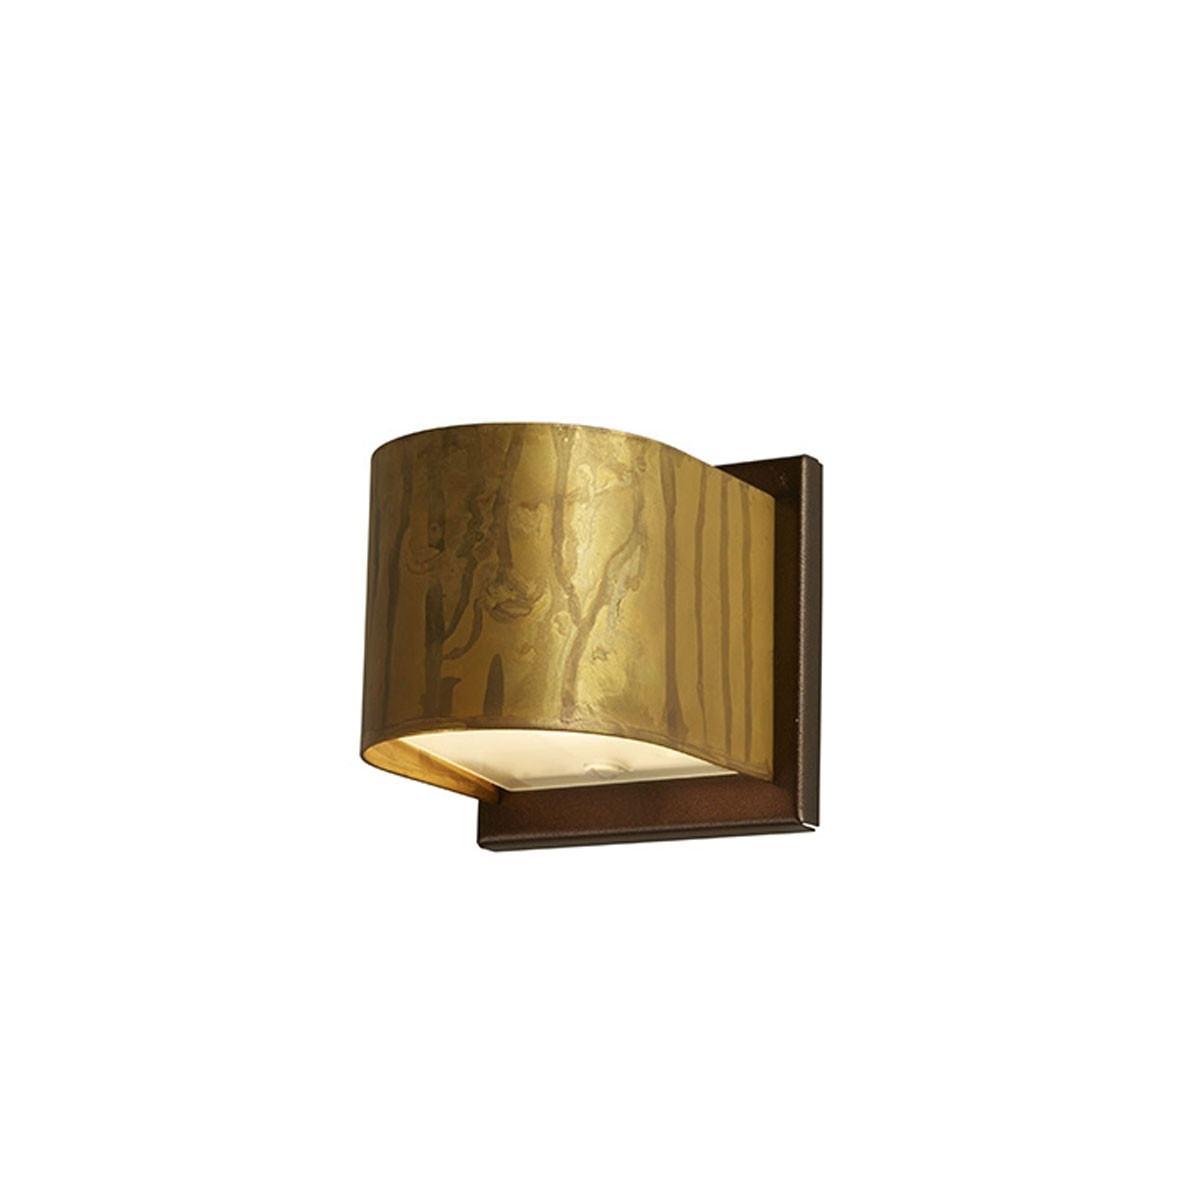 Gibas LOLA Wall Light - Small/Round - Distressed Brass